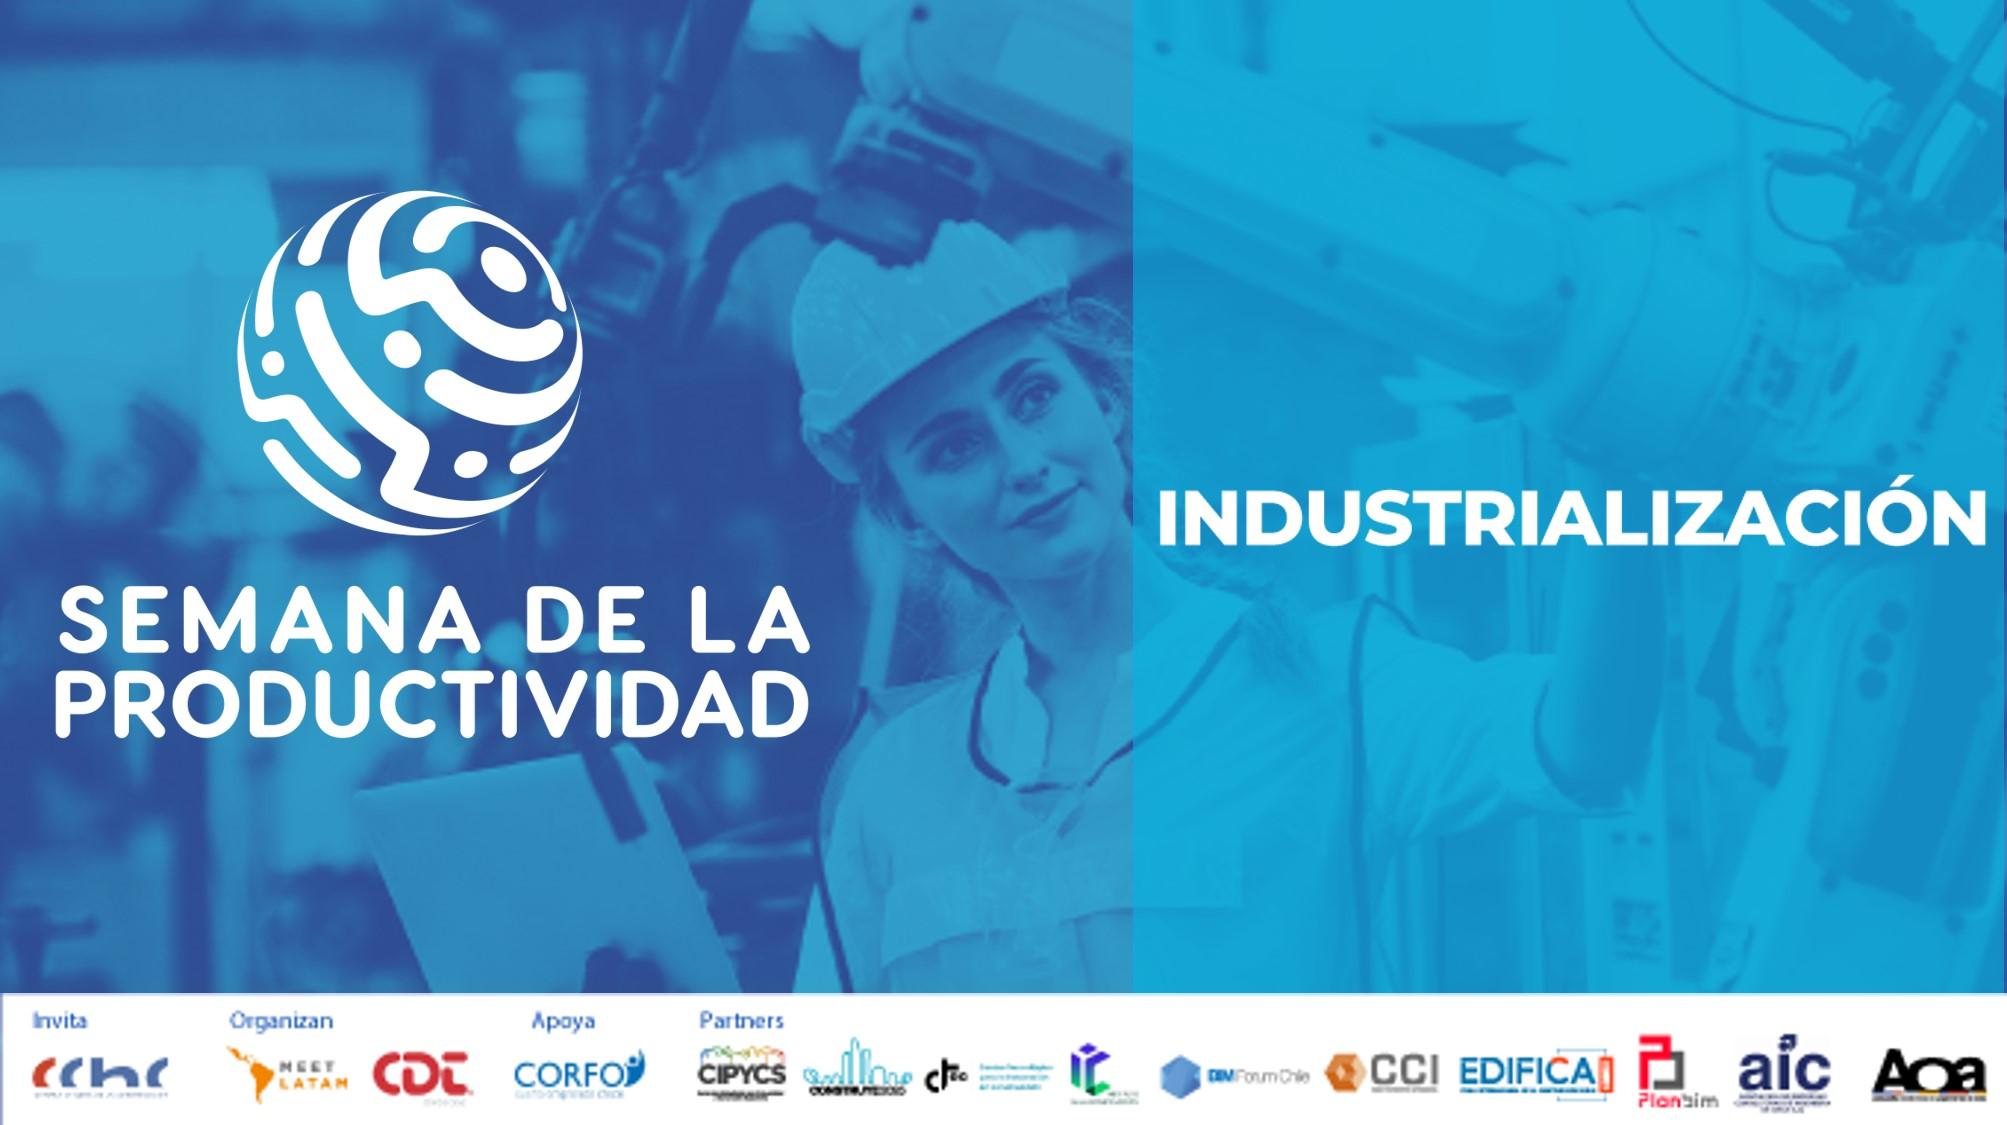 industrializaci%C3%B3n.jpg